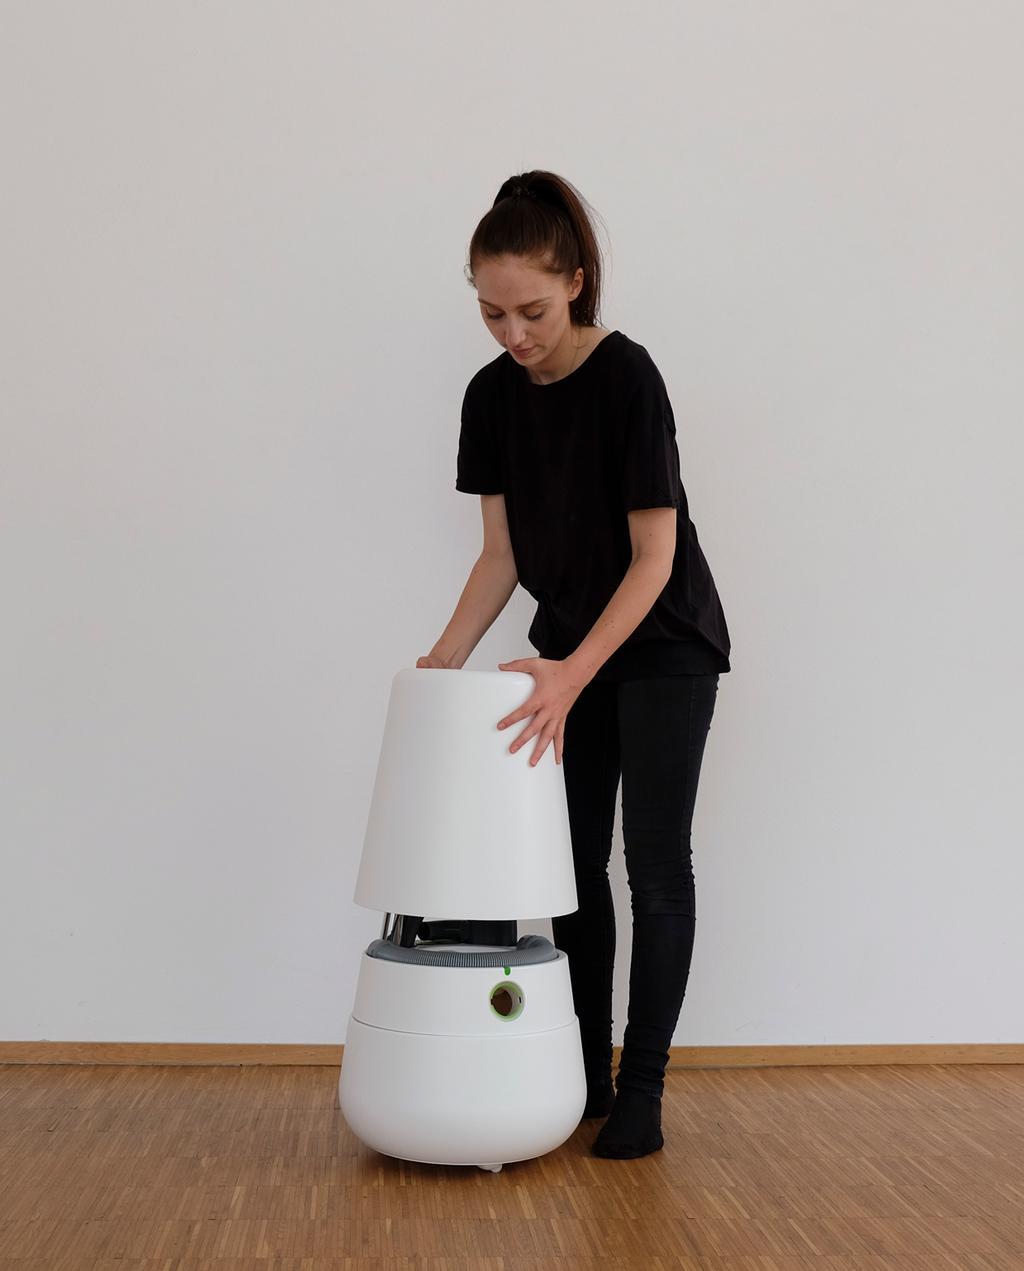 Viktoria Richter stofzuiger decoratie StudentDesign blog | goede voornemens